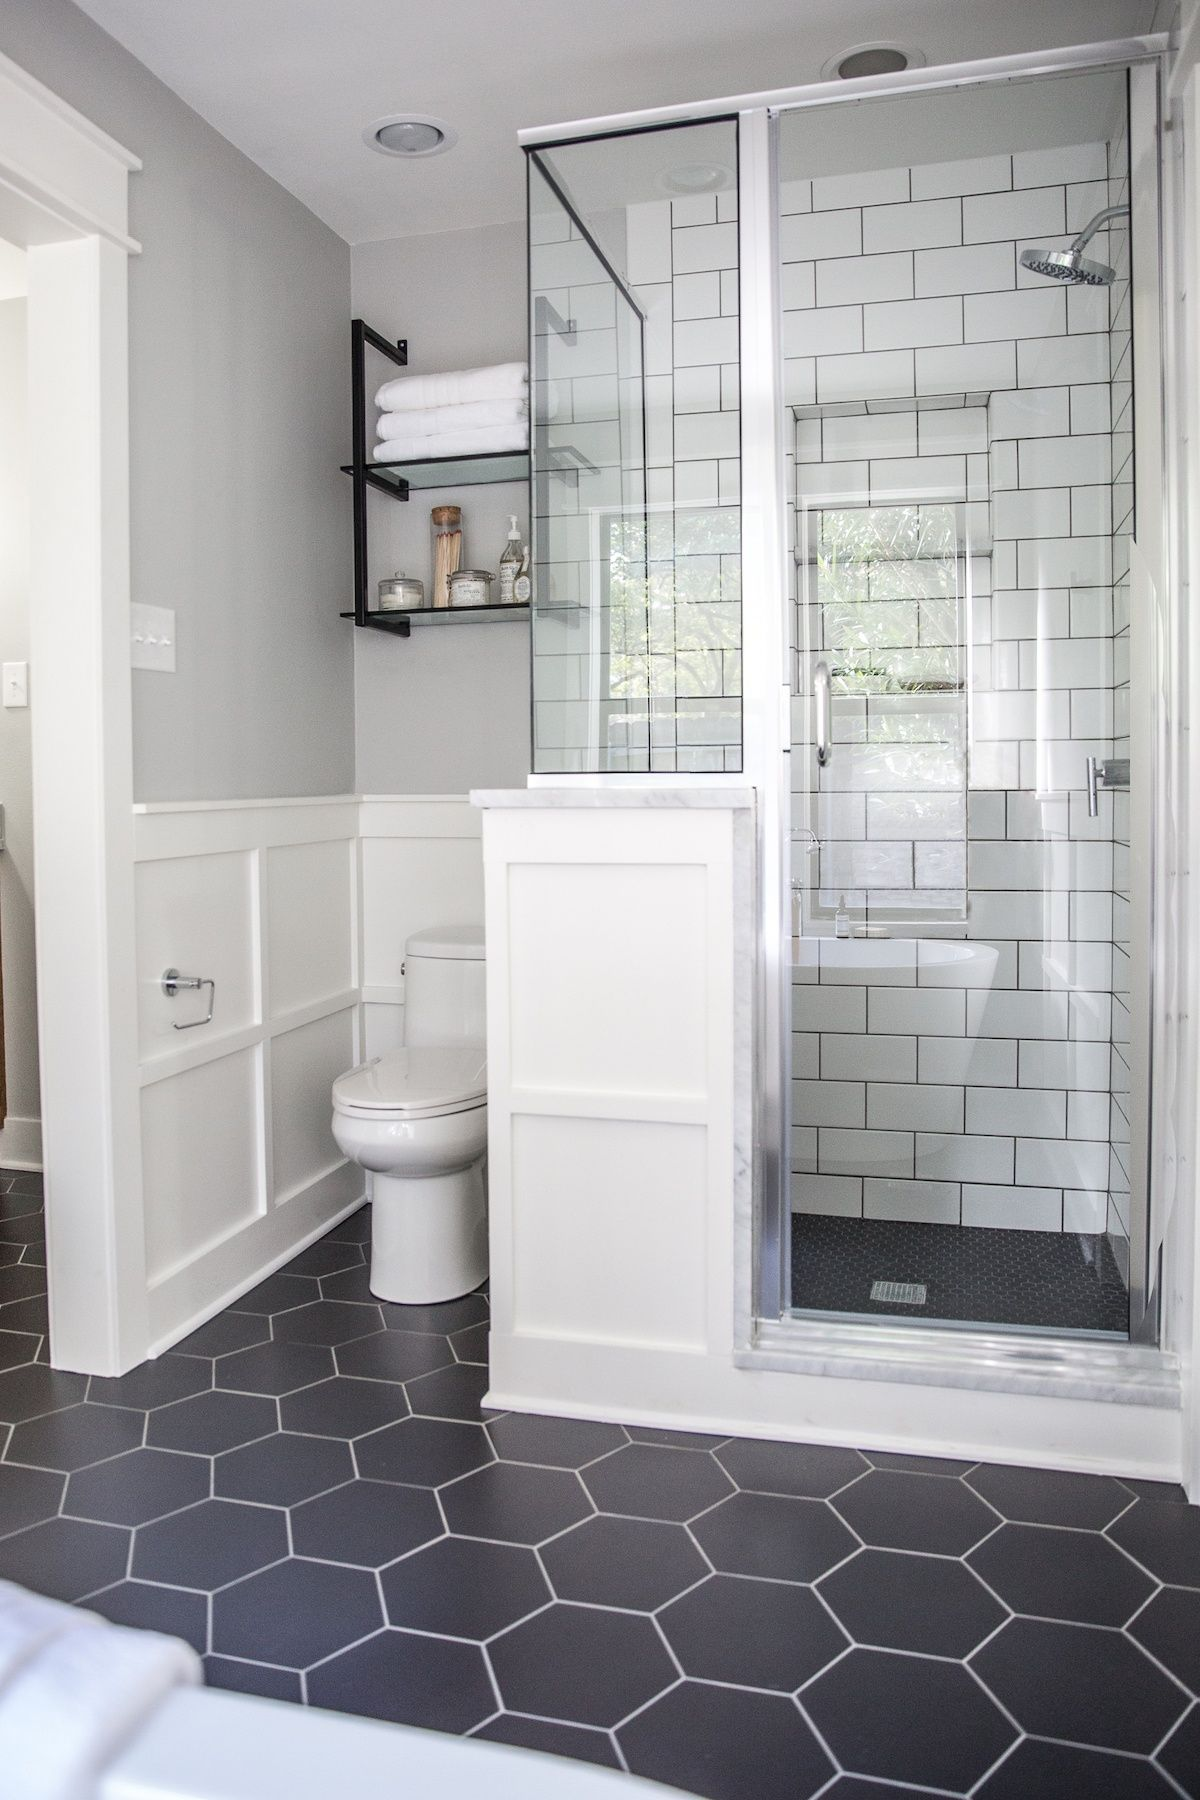 Bathroom Gray Subway Tile the family bathroom combines grey subway tile on the shower walls